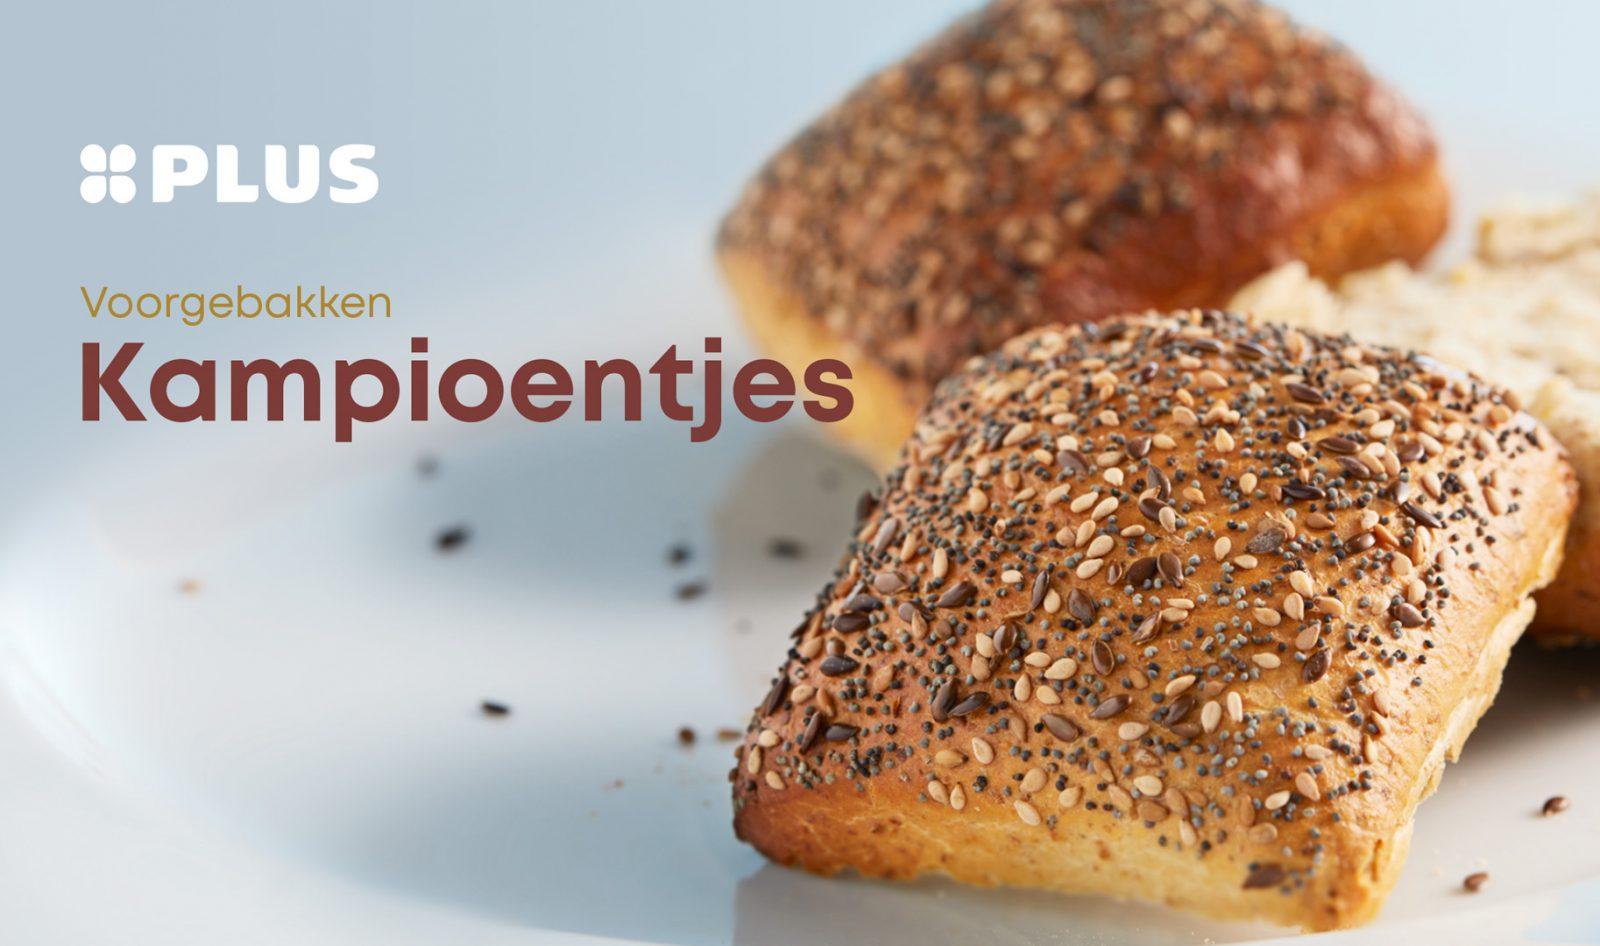 Floris Holtland - packaging photography - bread - kampioentjes